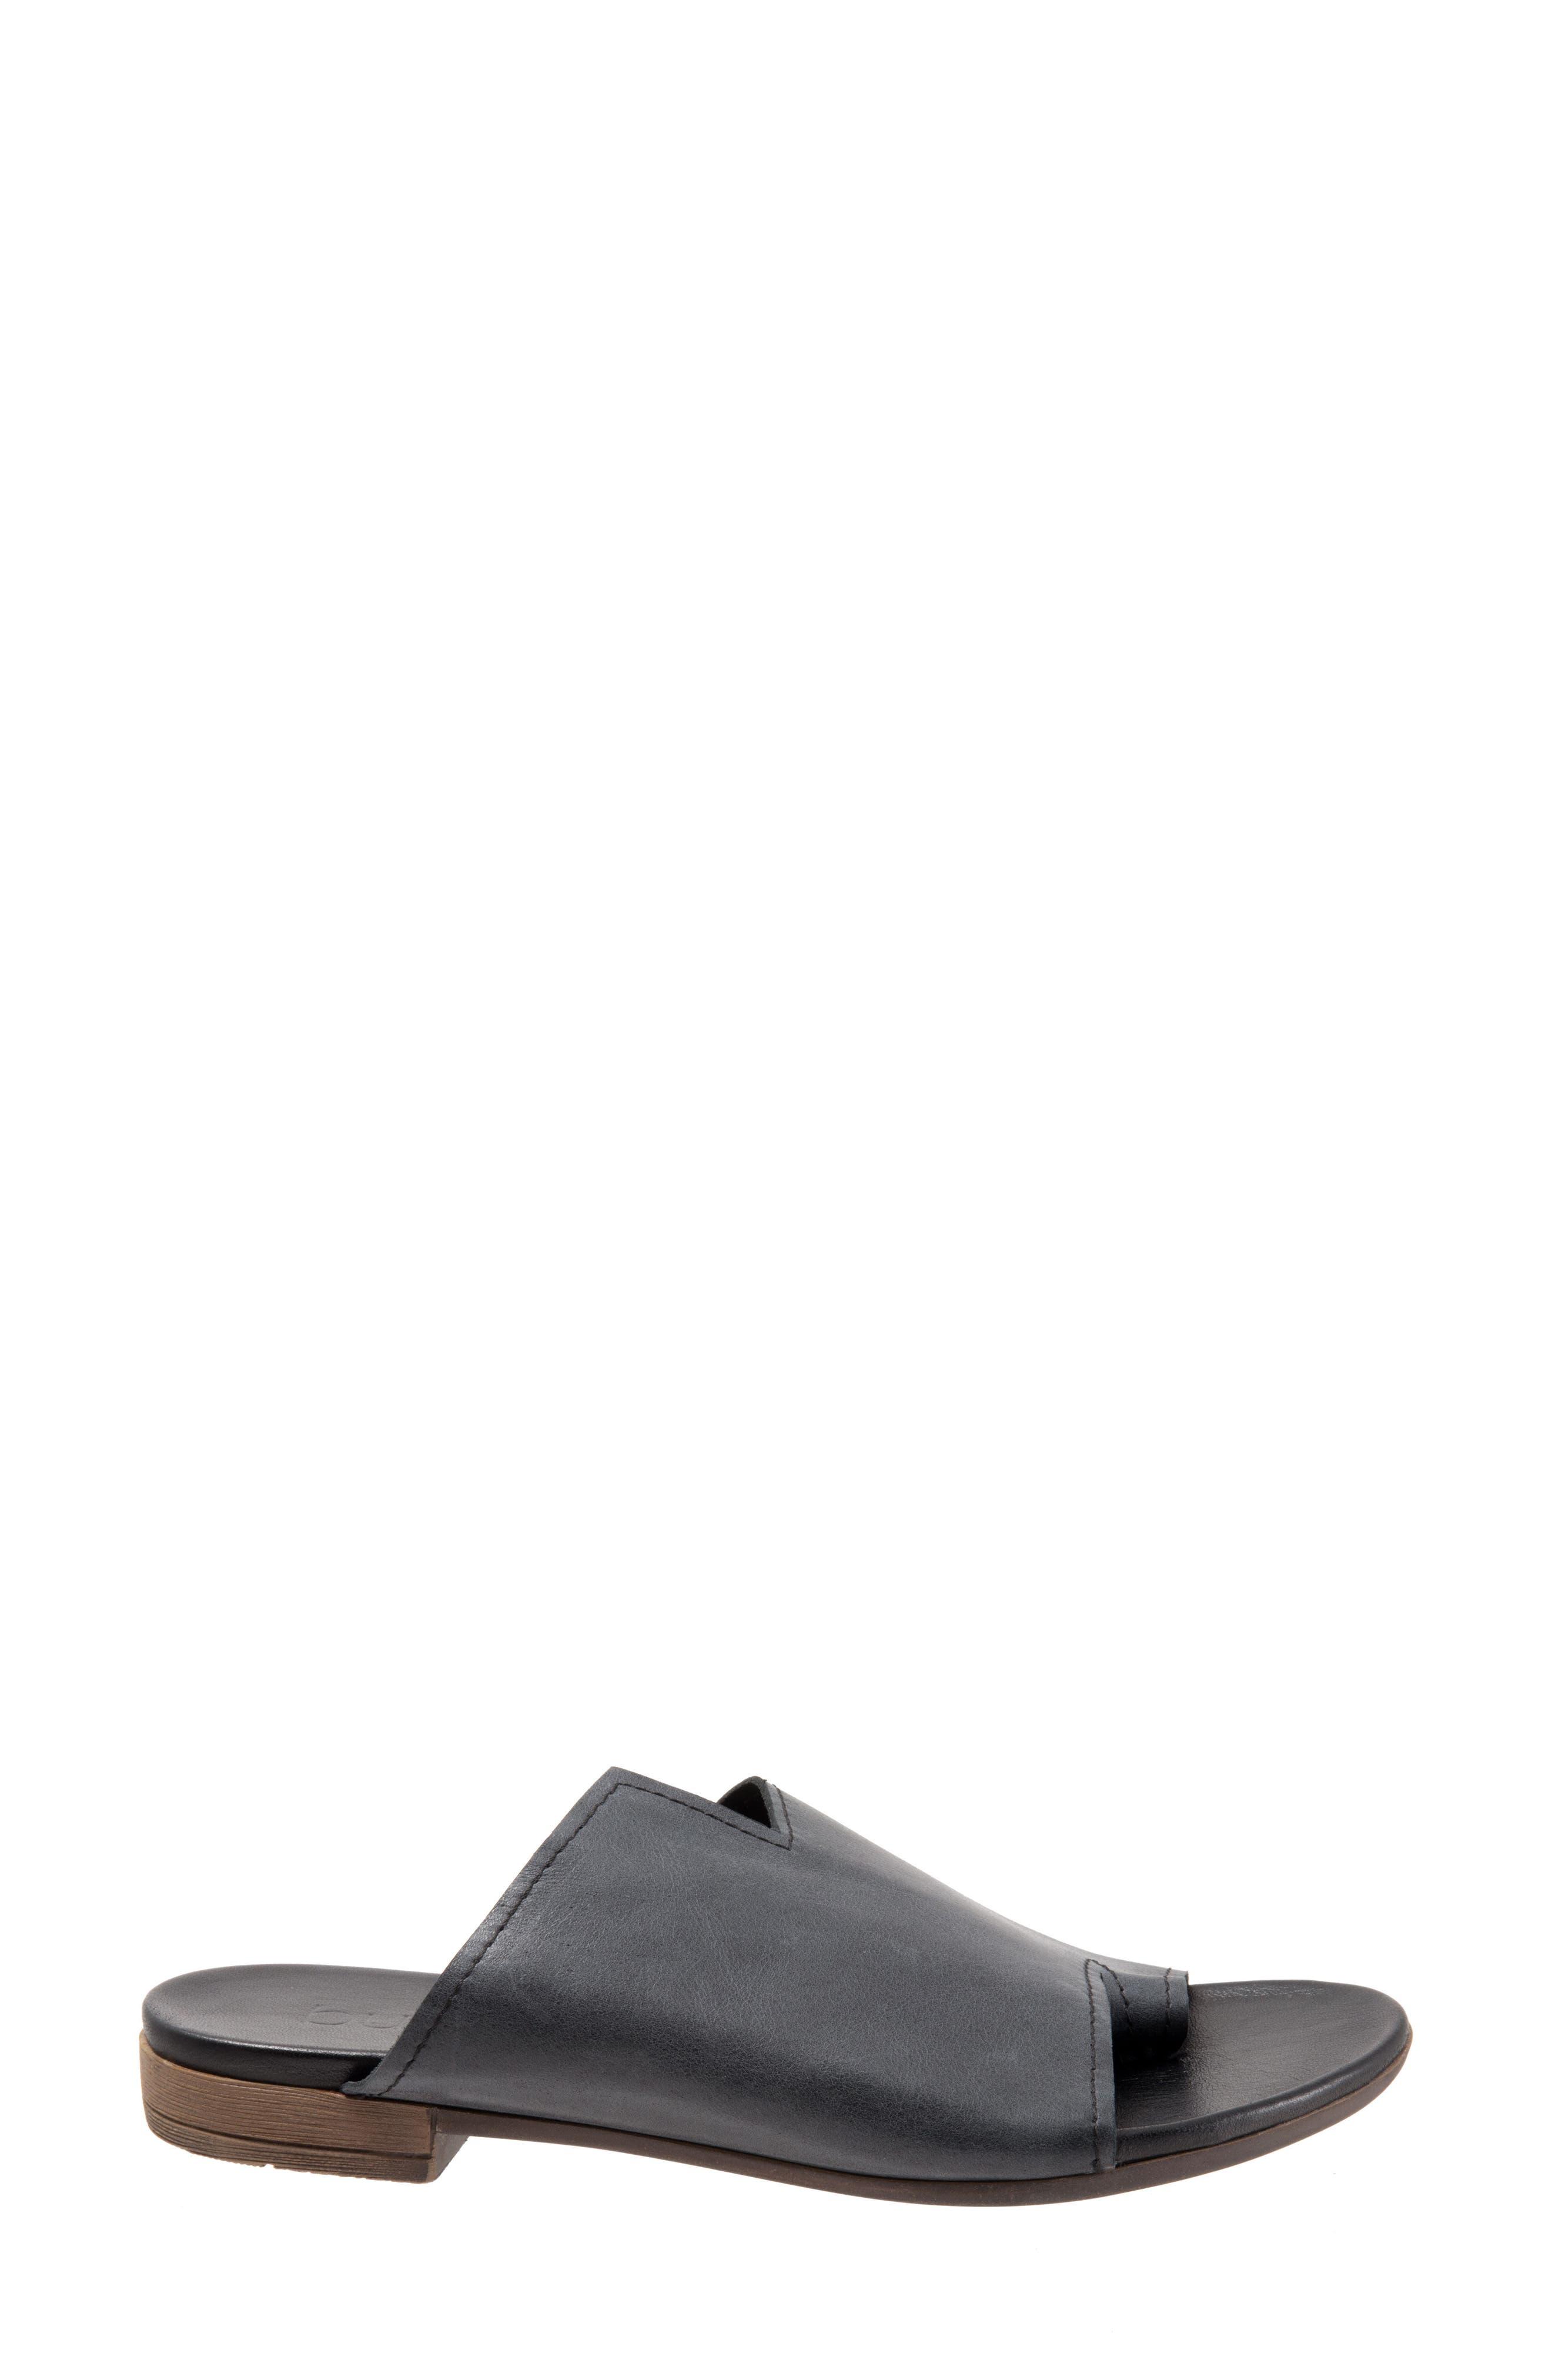 Tulla Sandal,                             Alternate thumbnail 3, color,                             Black Leather